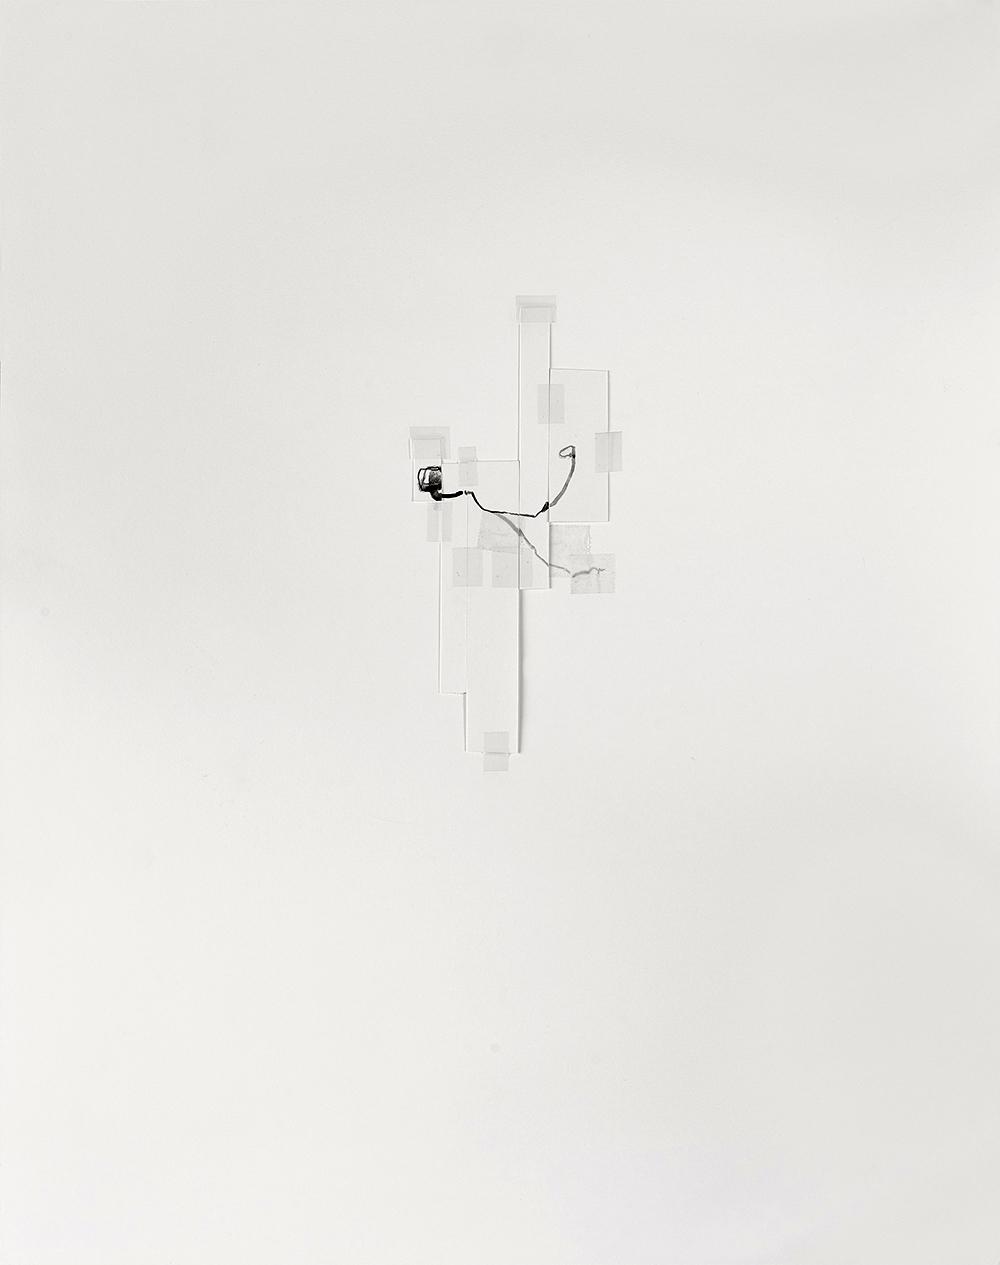 stillness,  2015 collaboration with Janine Antoni  gouache, tape, paper 22 x 16 in / 56 x 41 cm